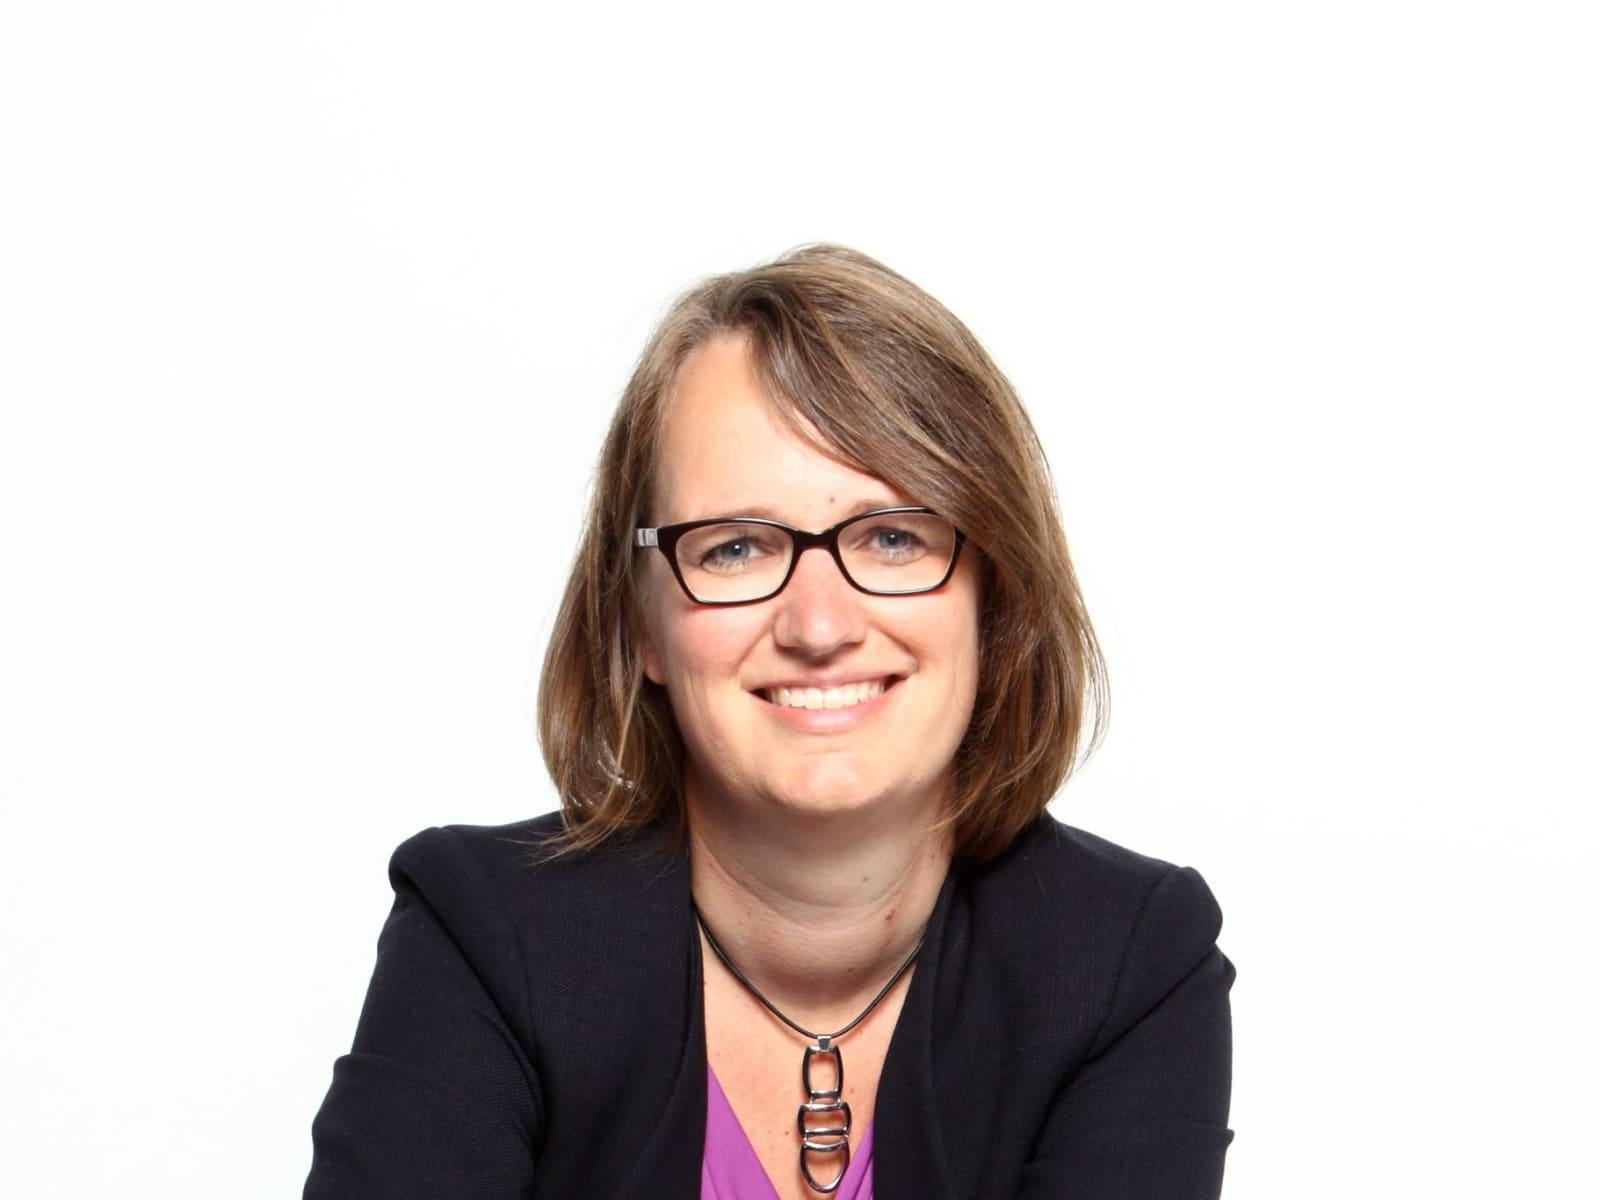 Marianne from Utrecht, Netherlands